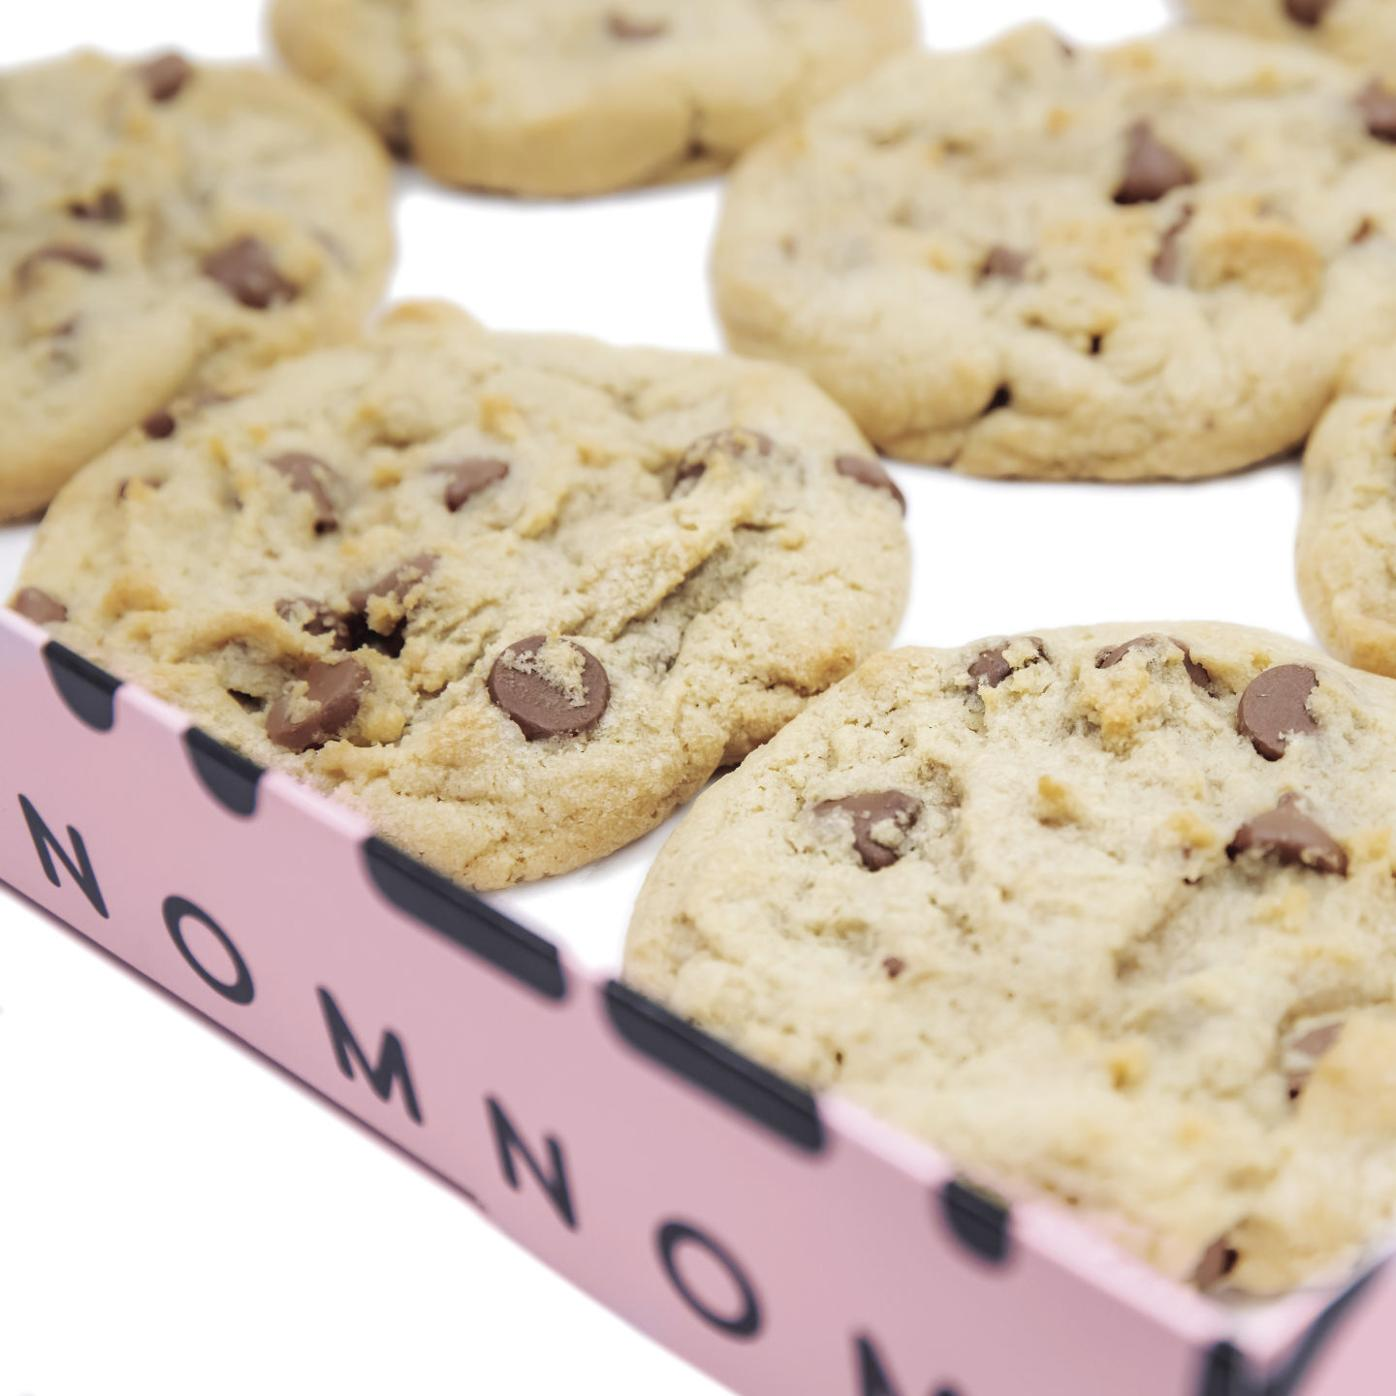 Crumbl cookies choco box on white